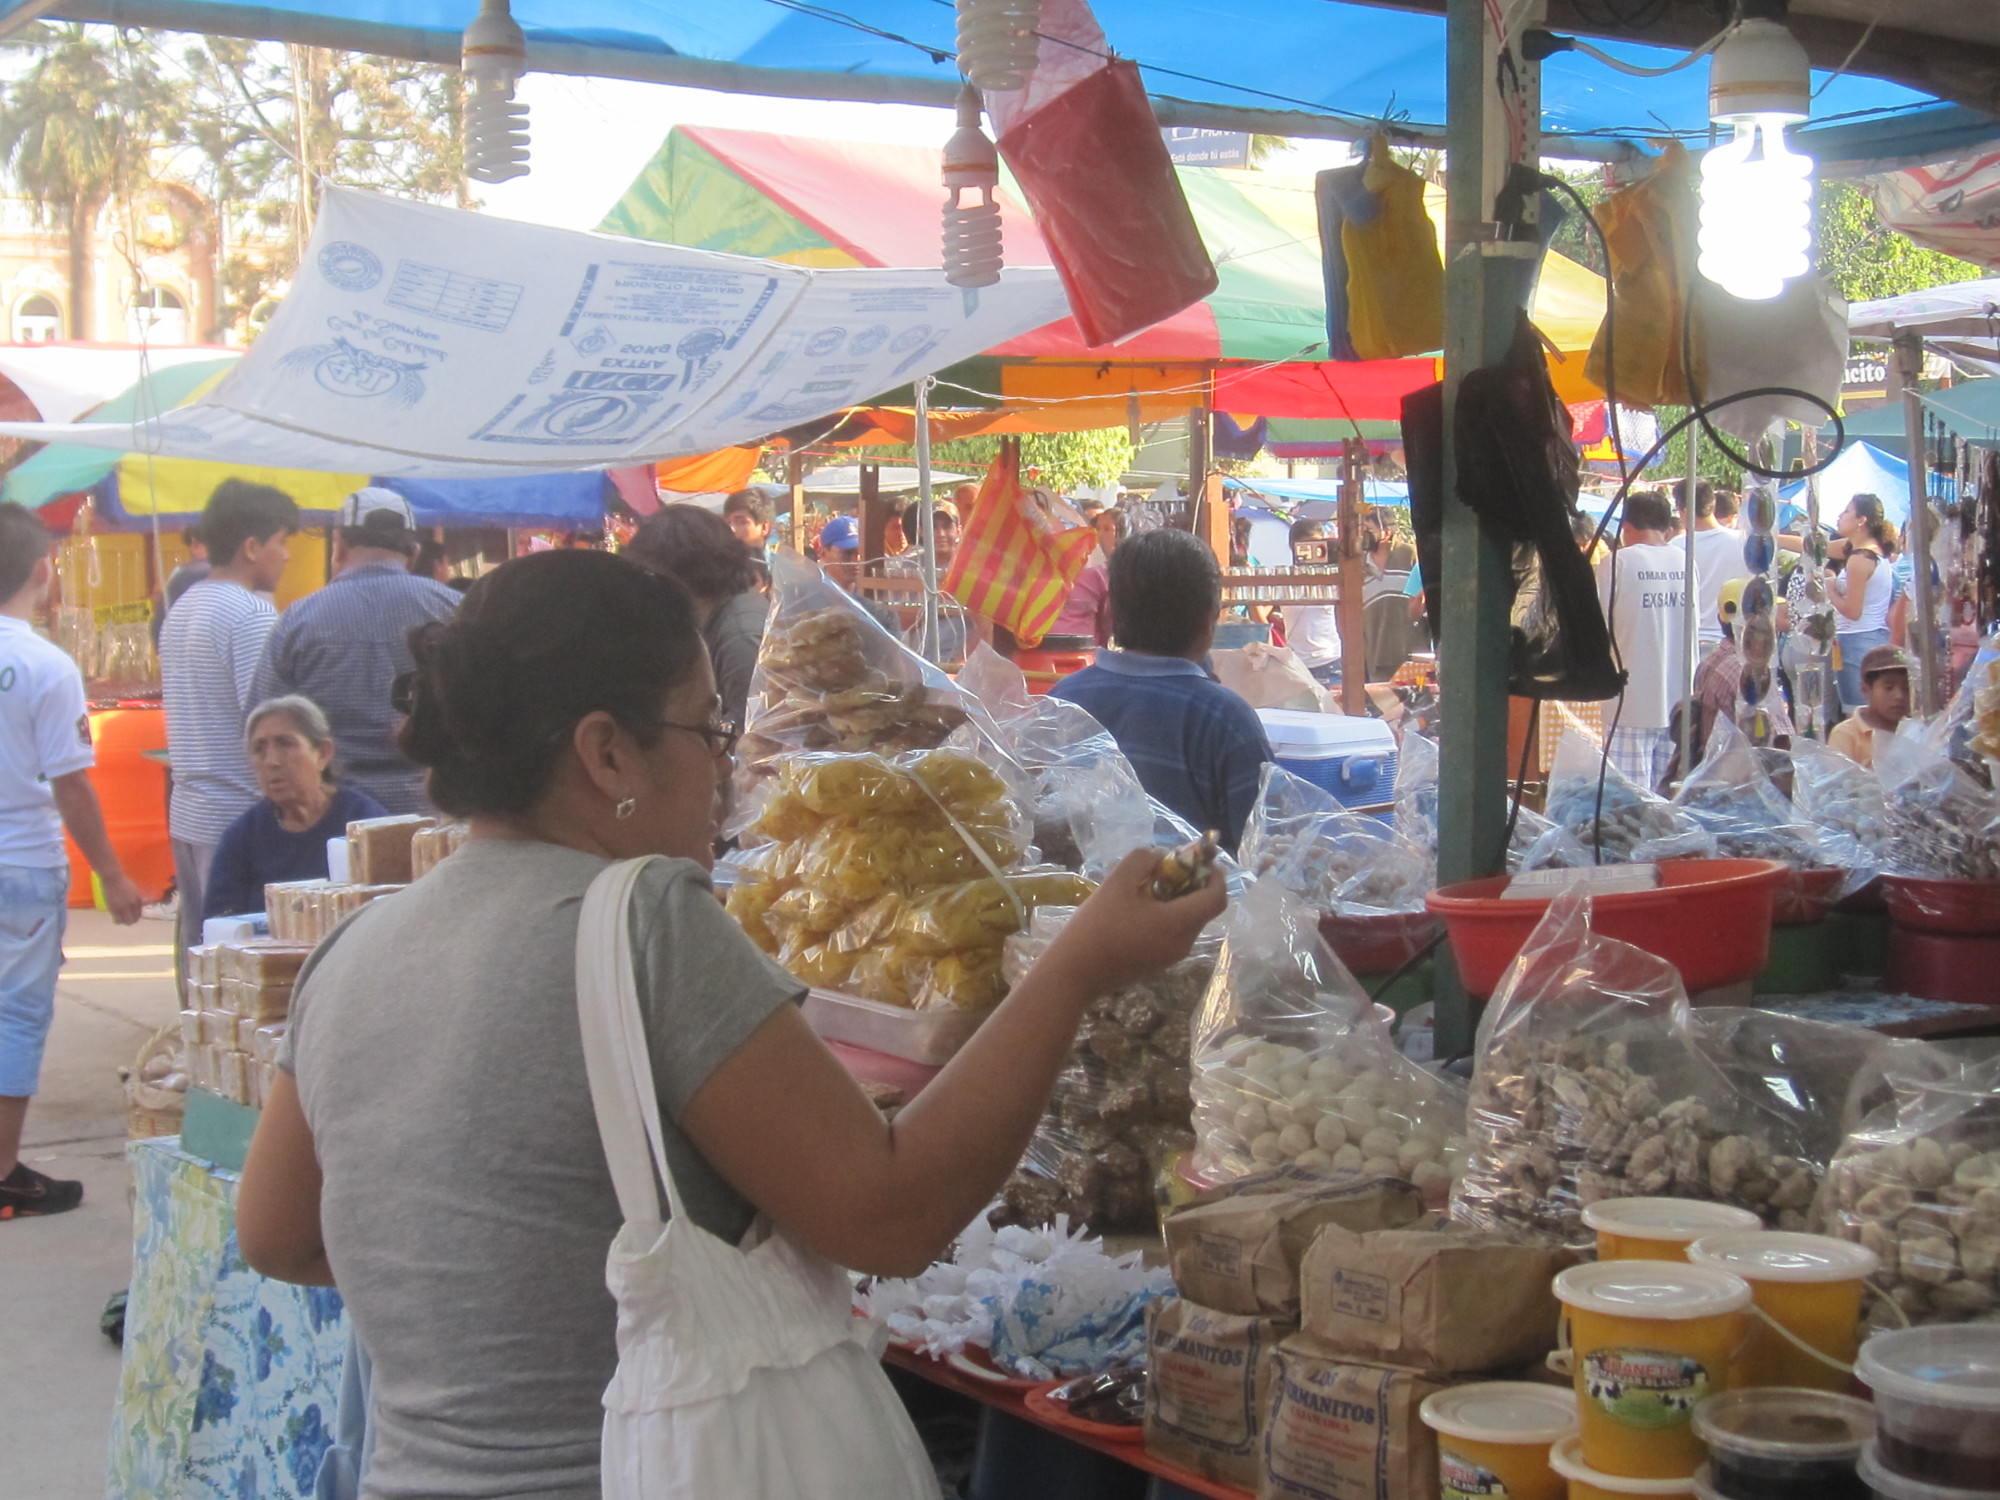 Festival fair in Motupe